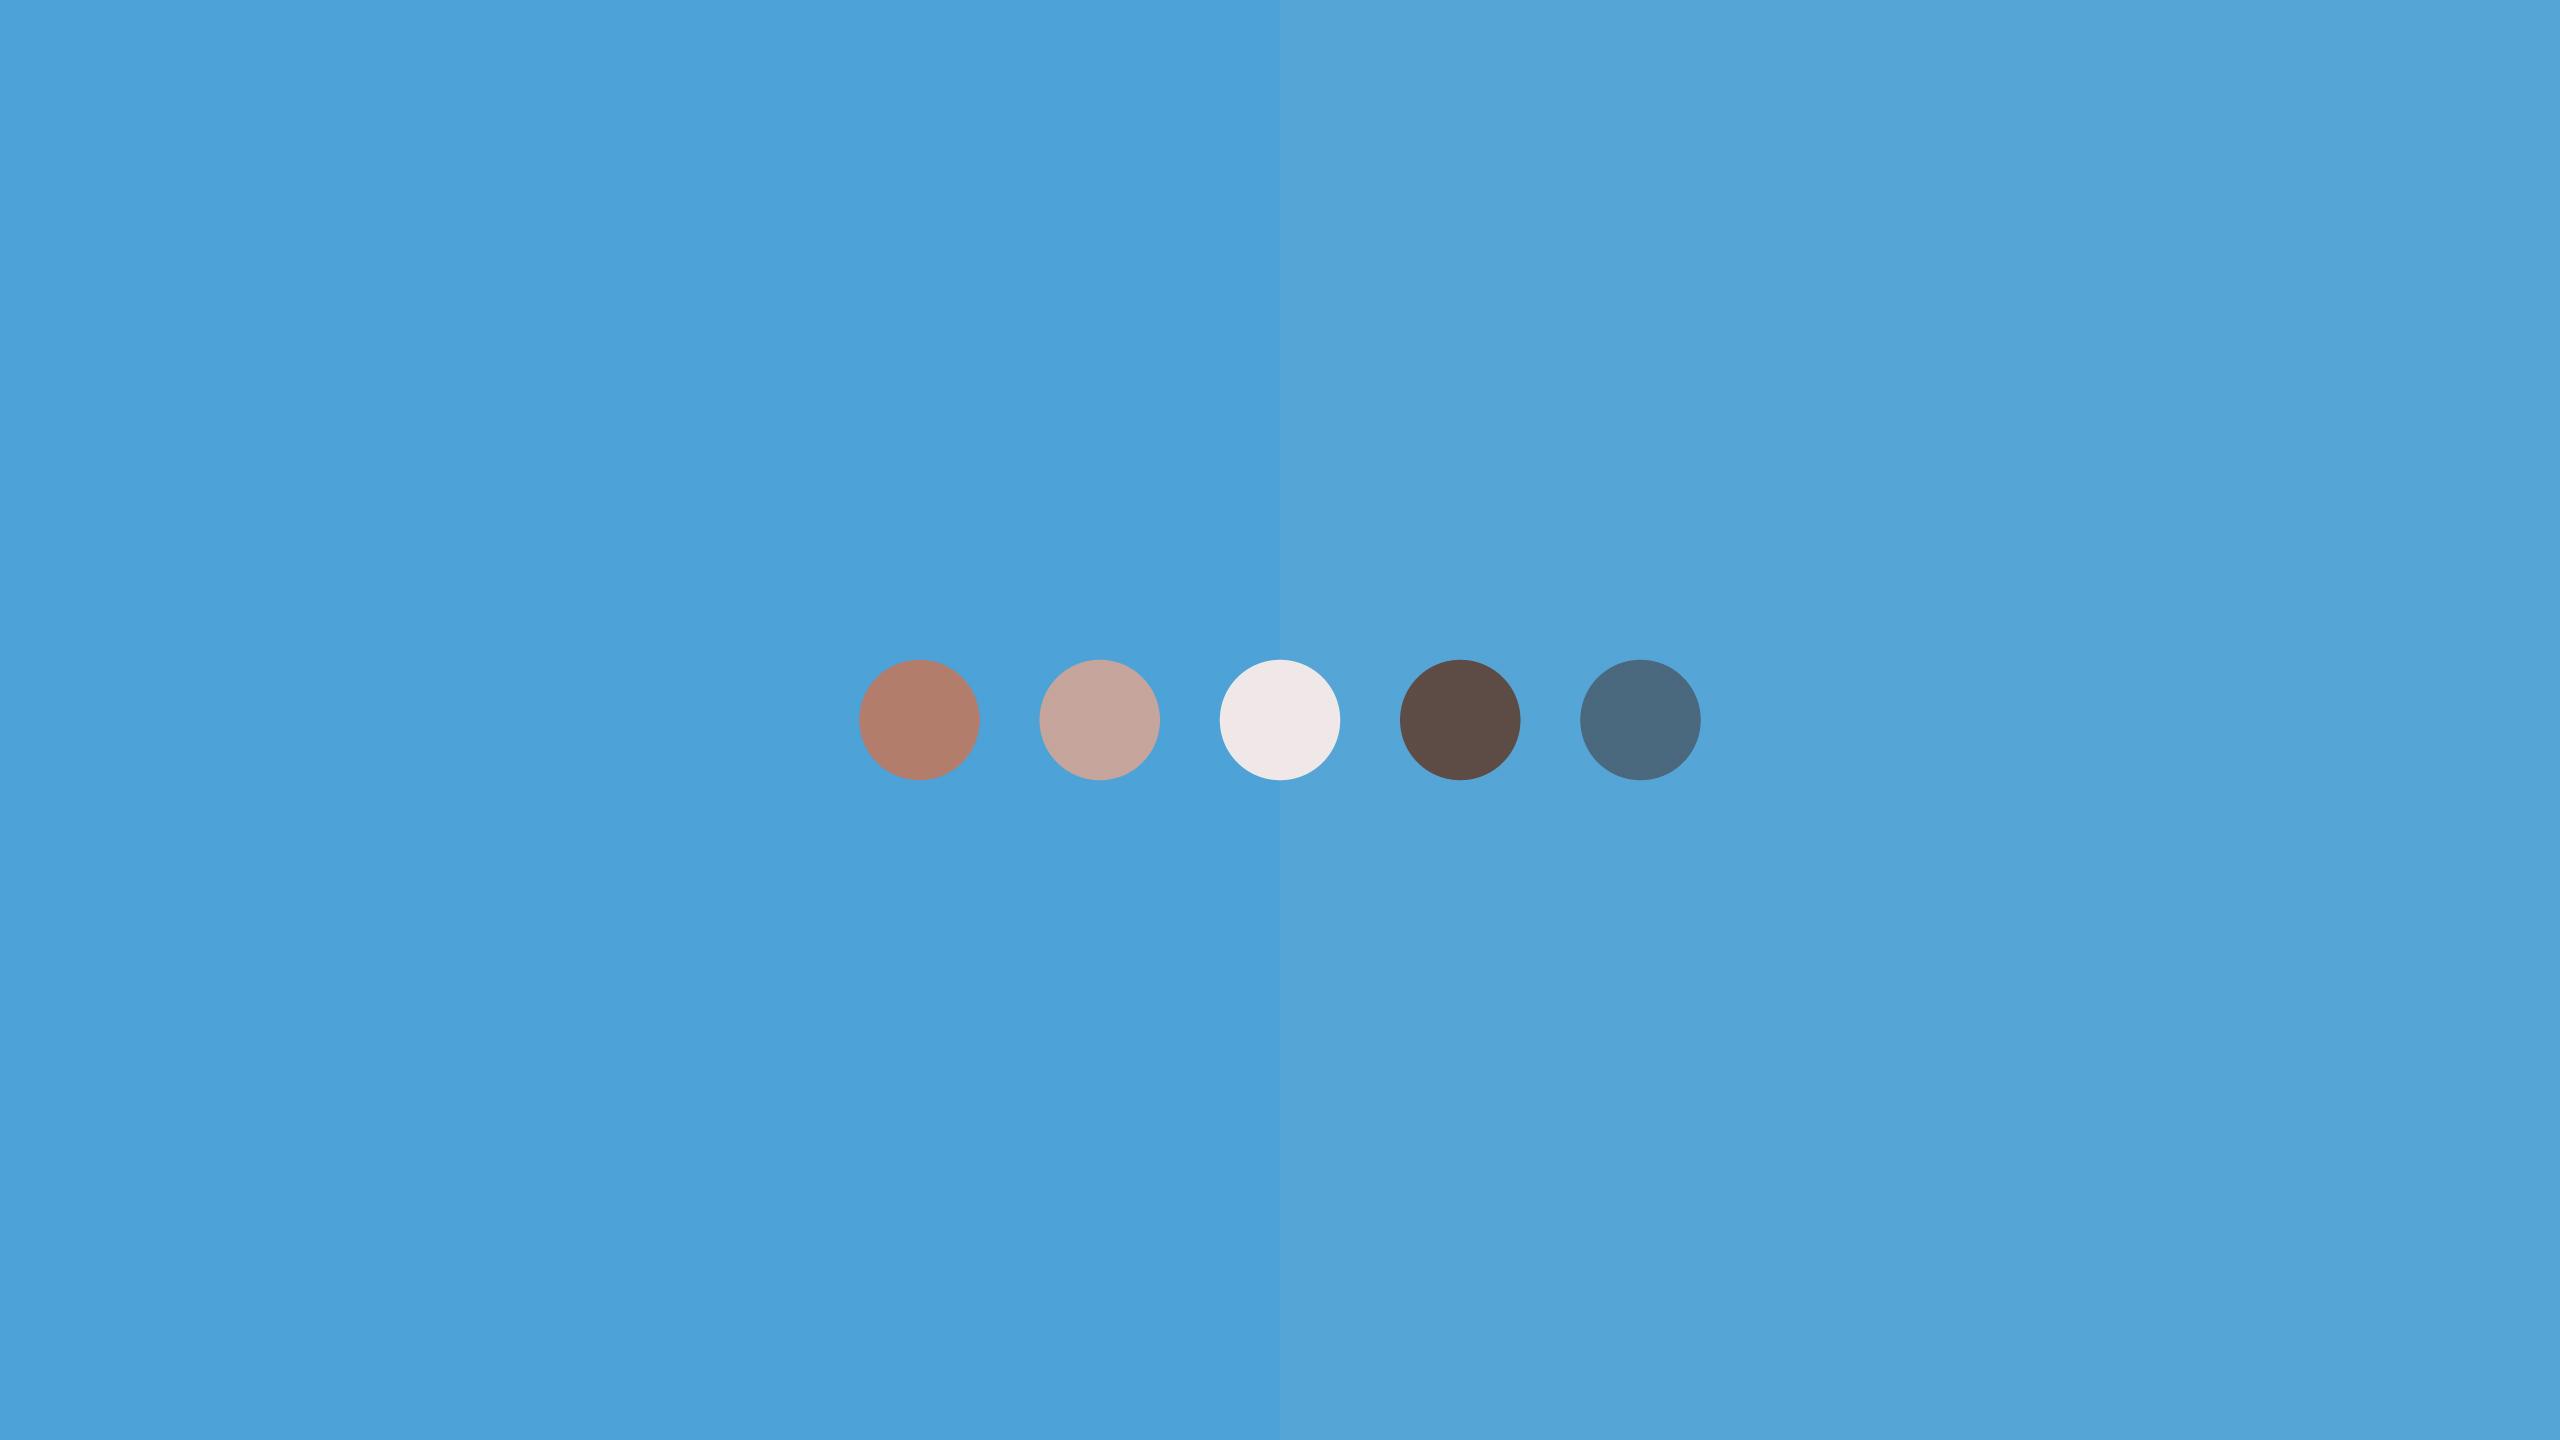 Aphex Twin announces new album SYRO 2560x1440